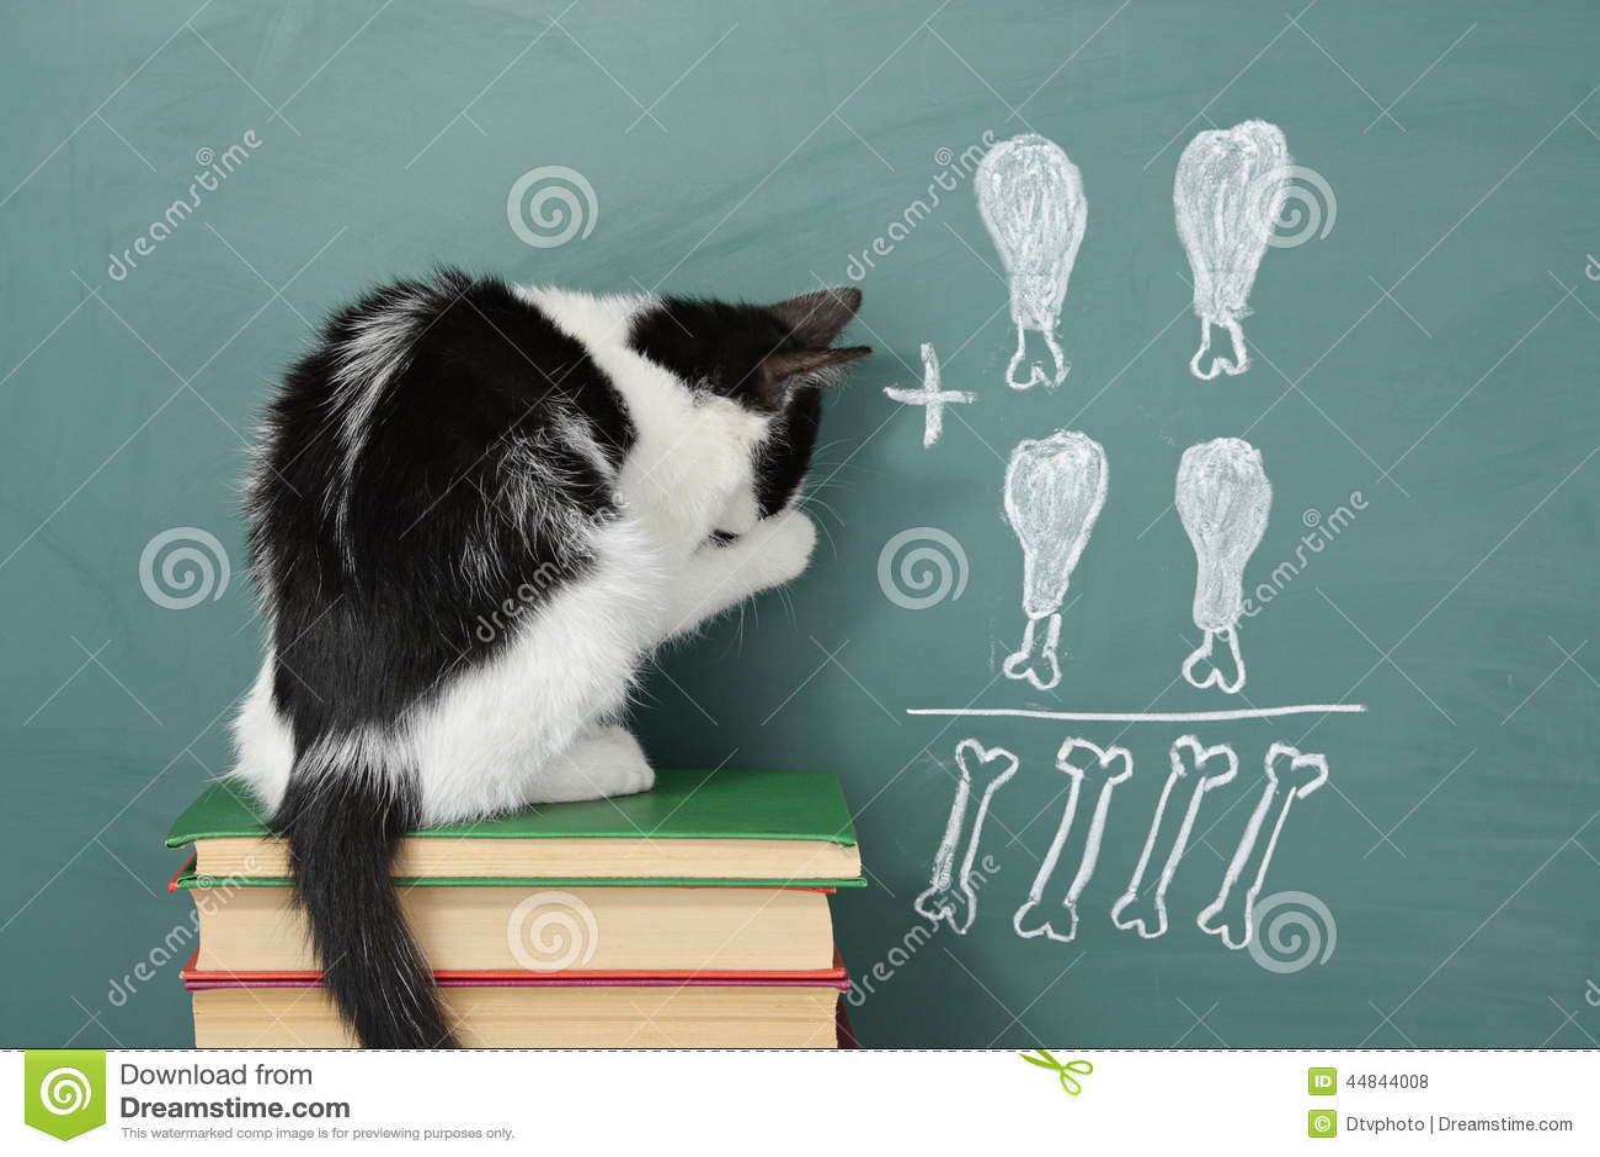 educated cat - photo #3